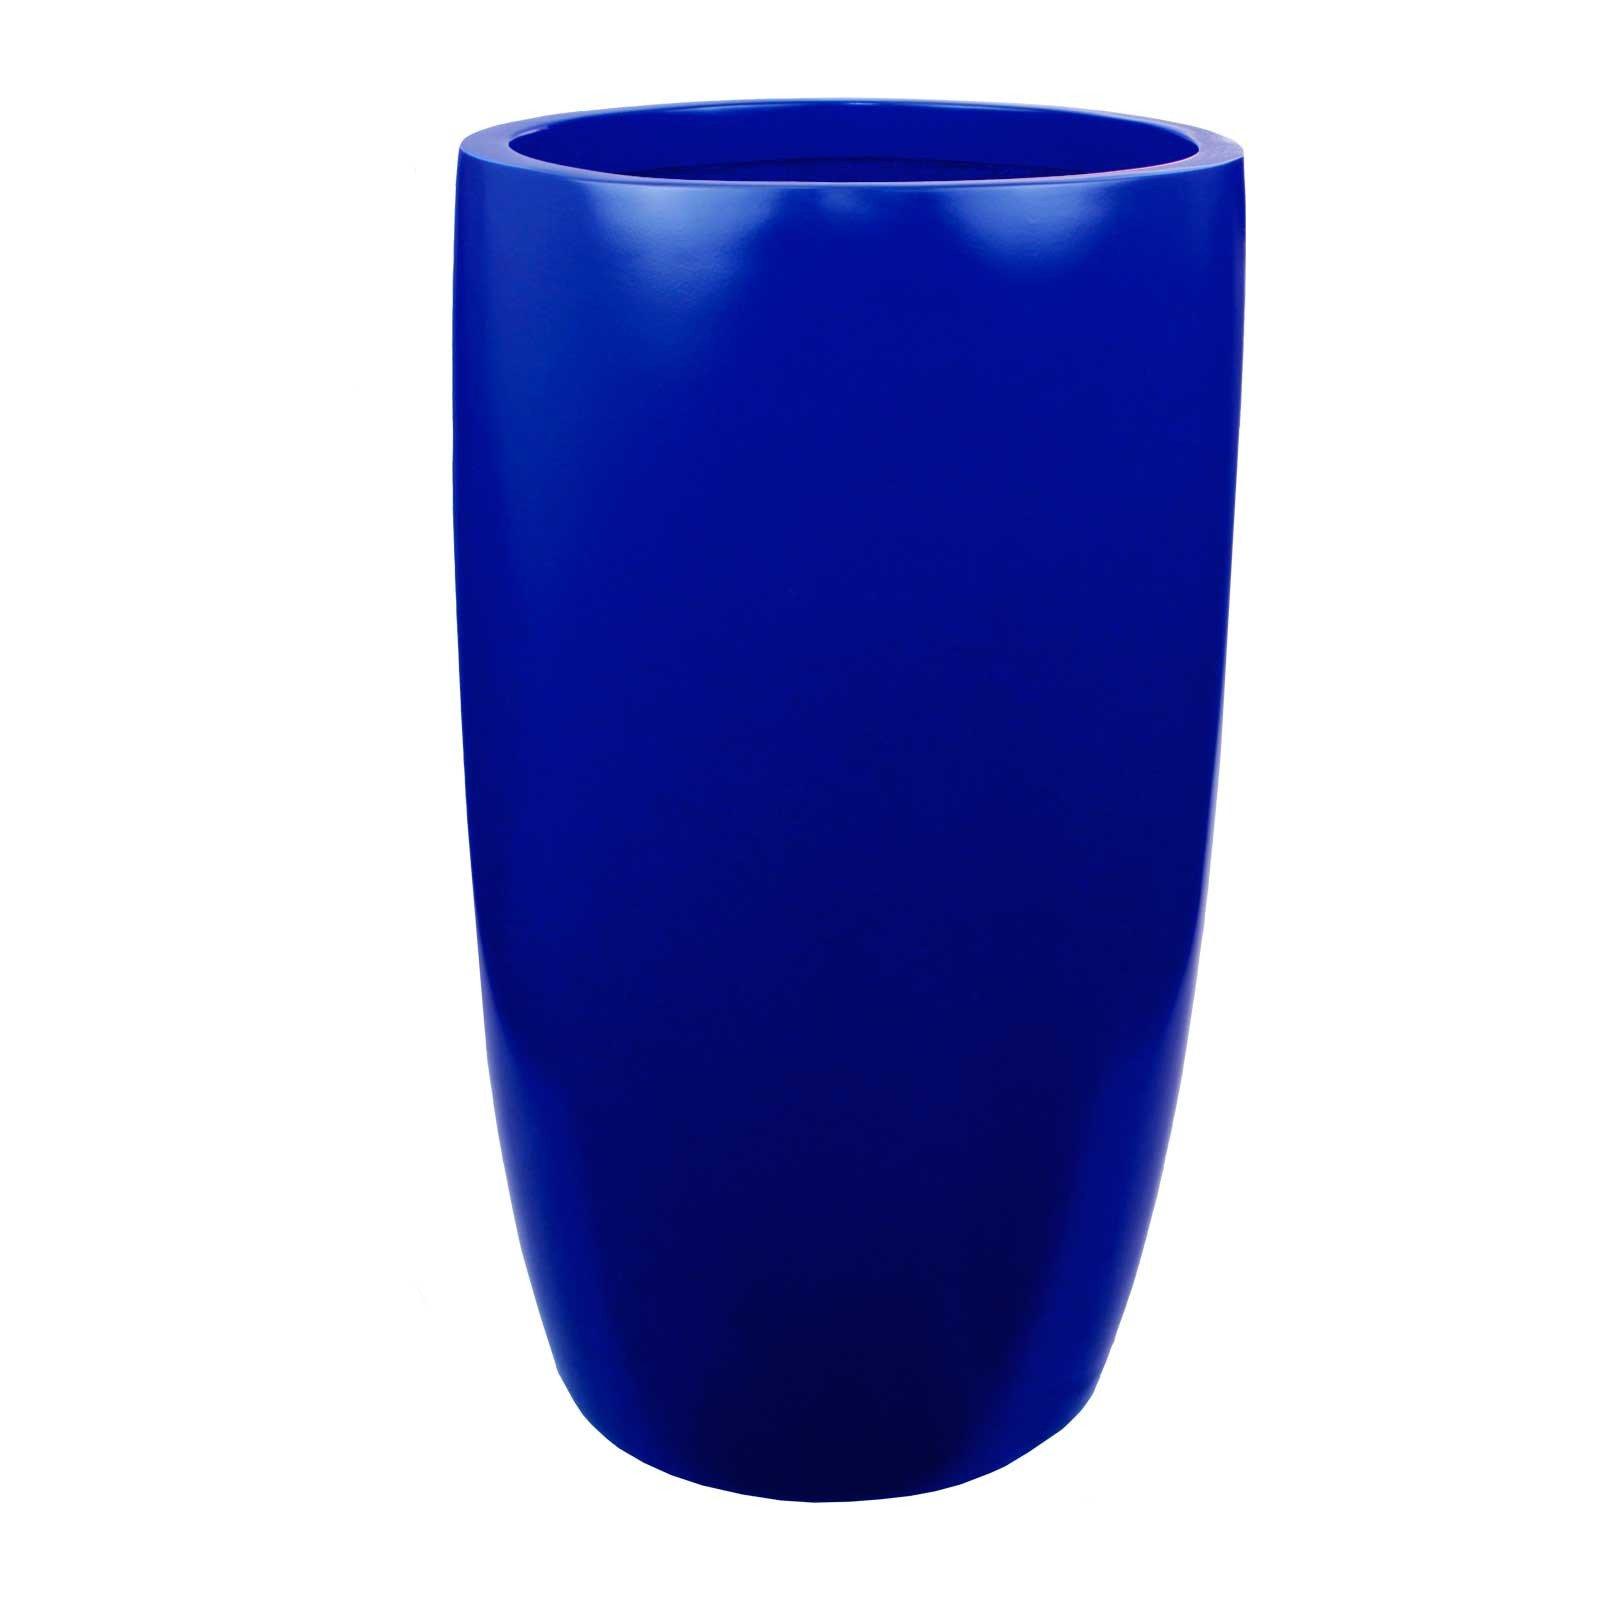 Round Plant Pot - Fiberglass - 14'/18'/24' Diameters